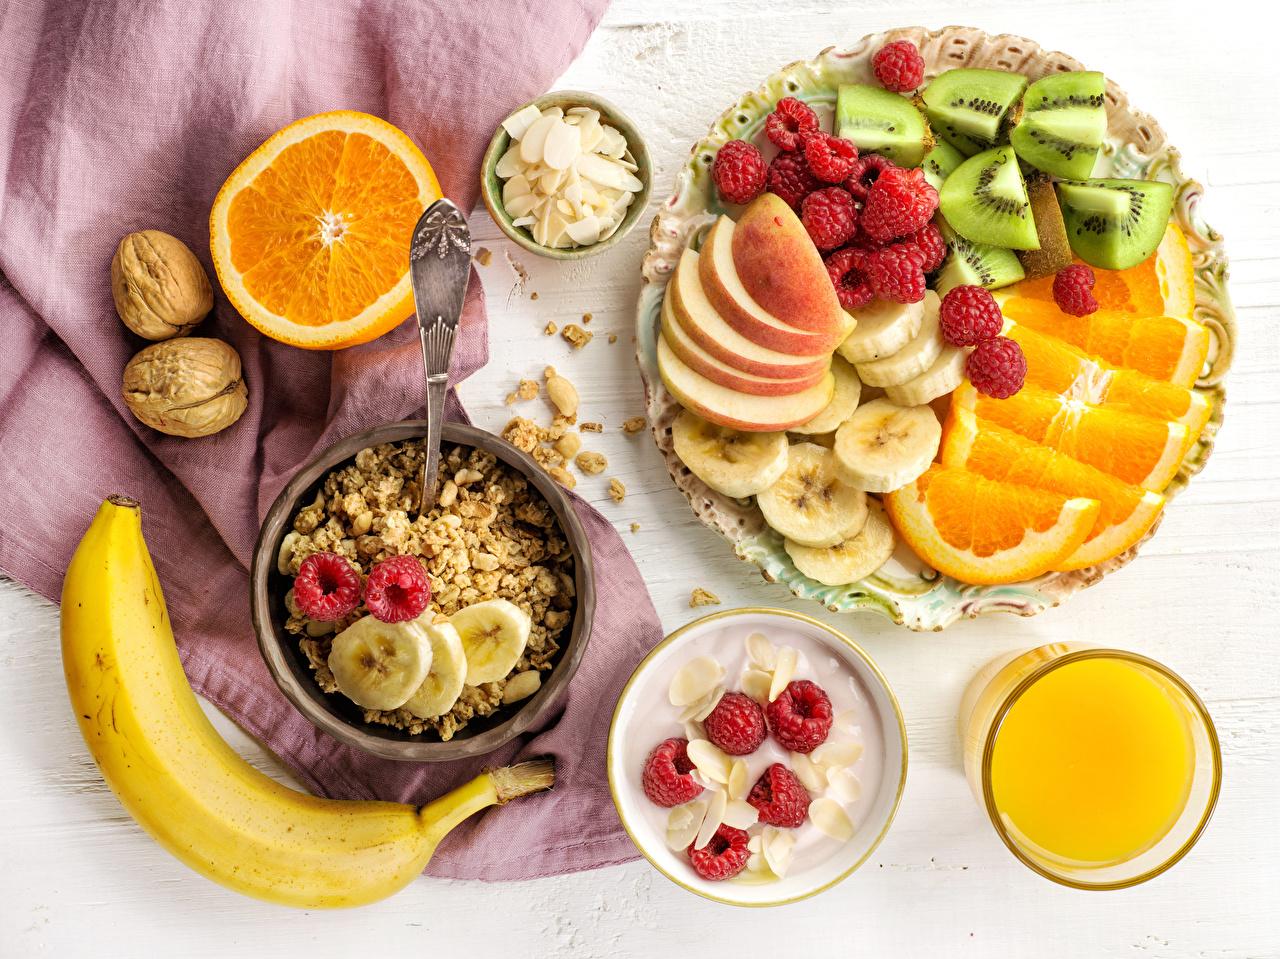 Photo Juice Breakfast Orange fruit Bananas Raspberry Highball glass Food Fruit Muesli Nuts